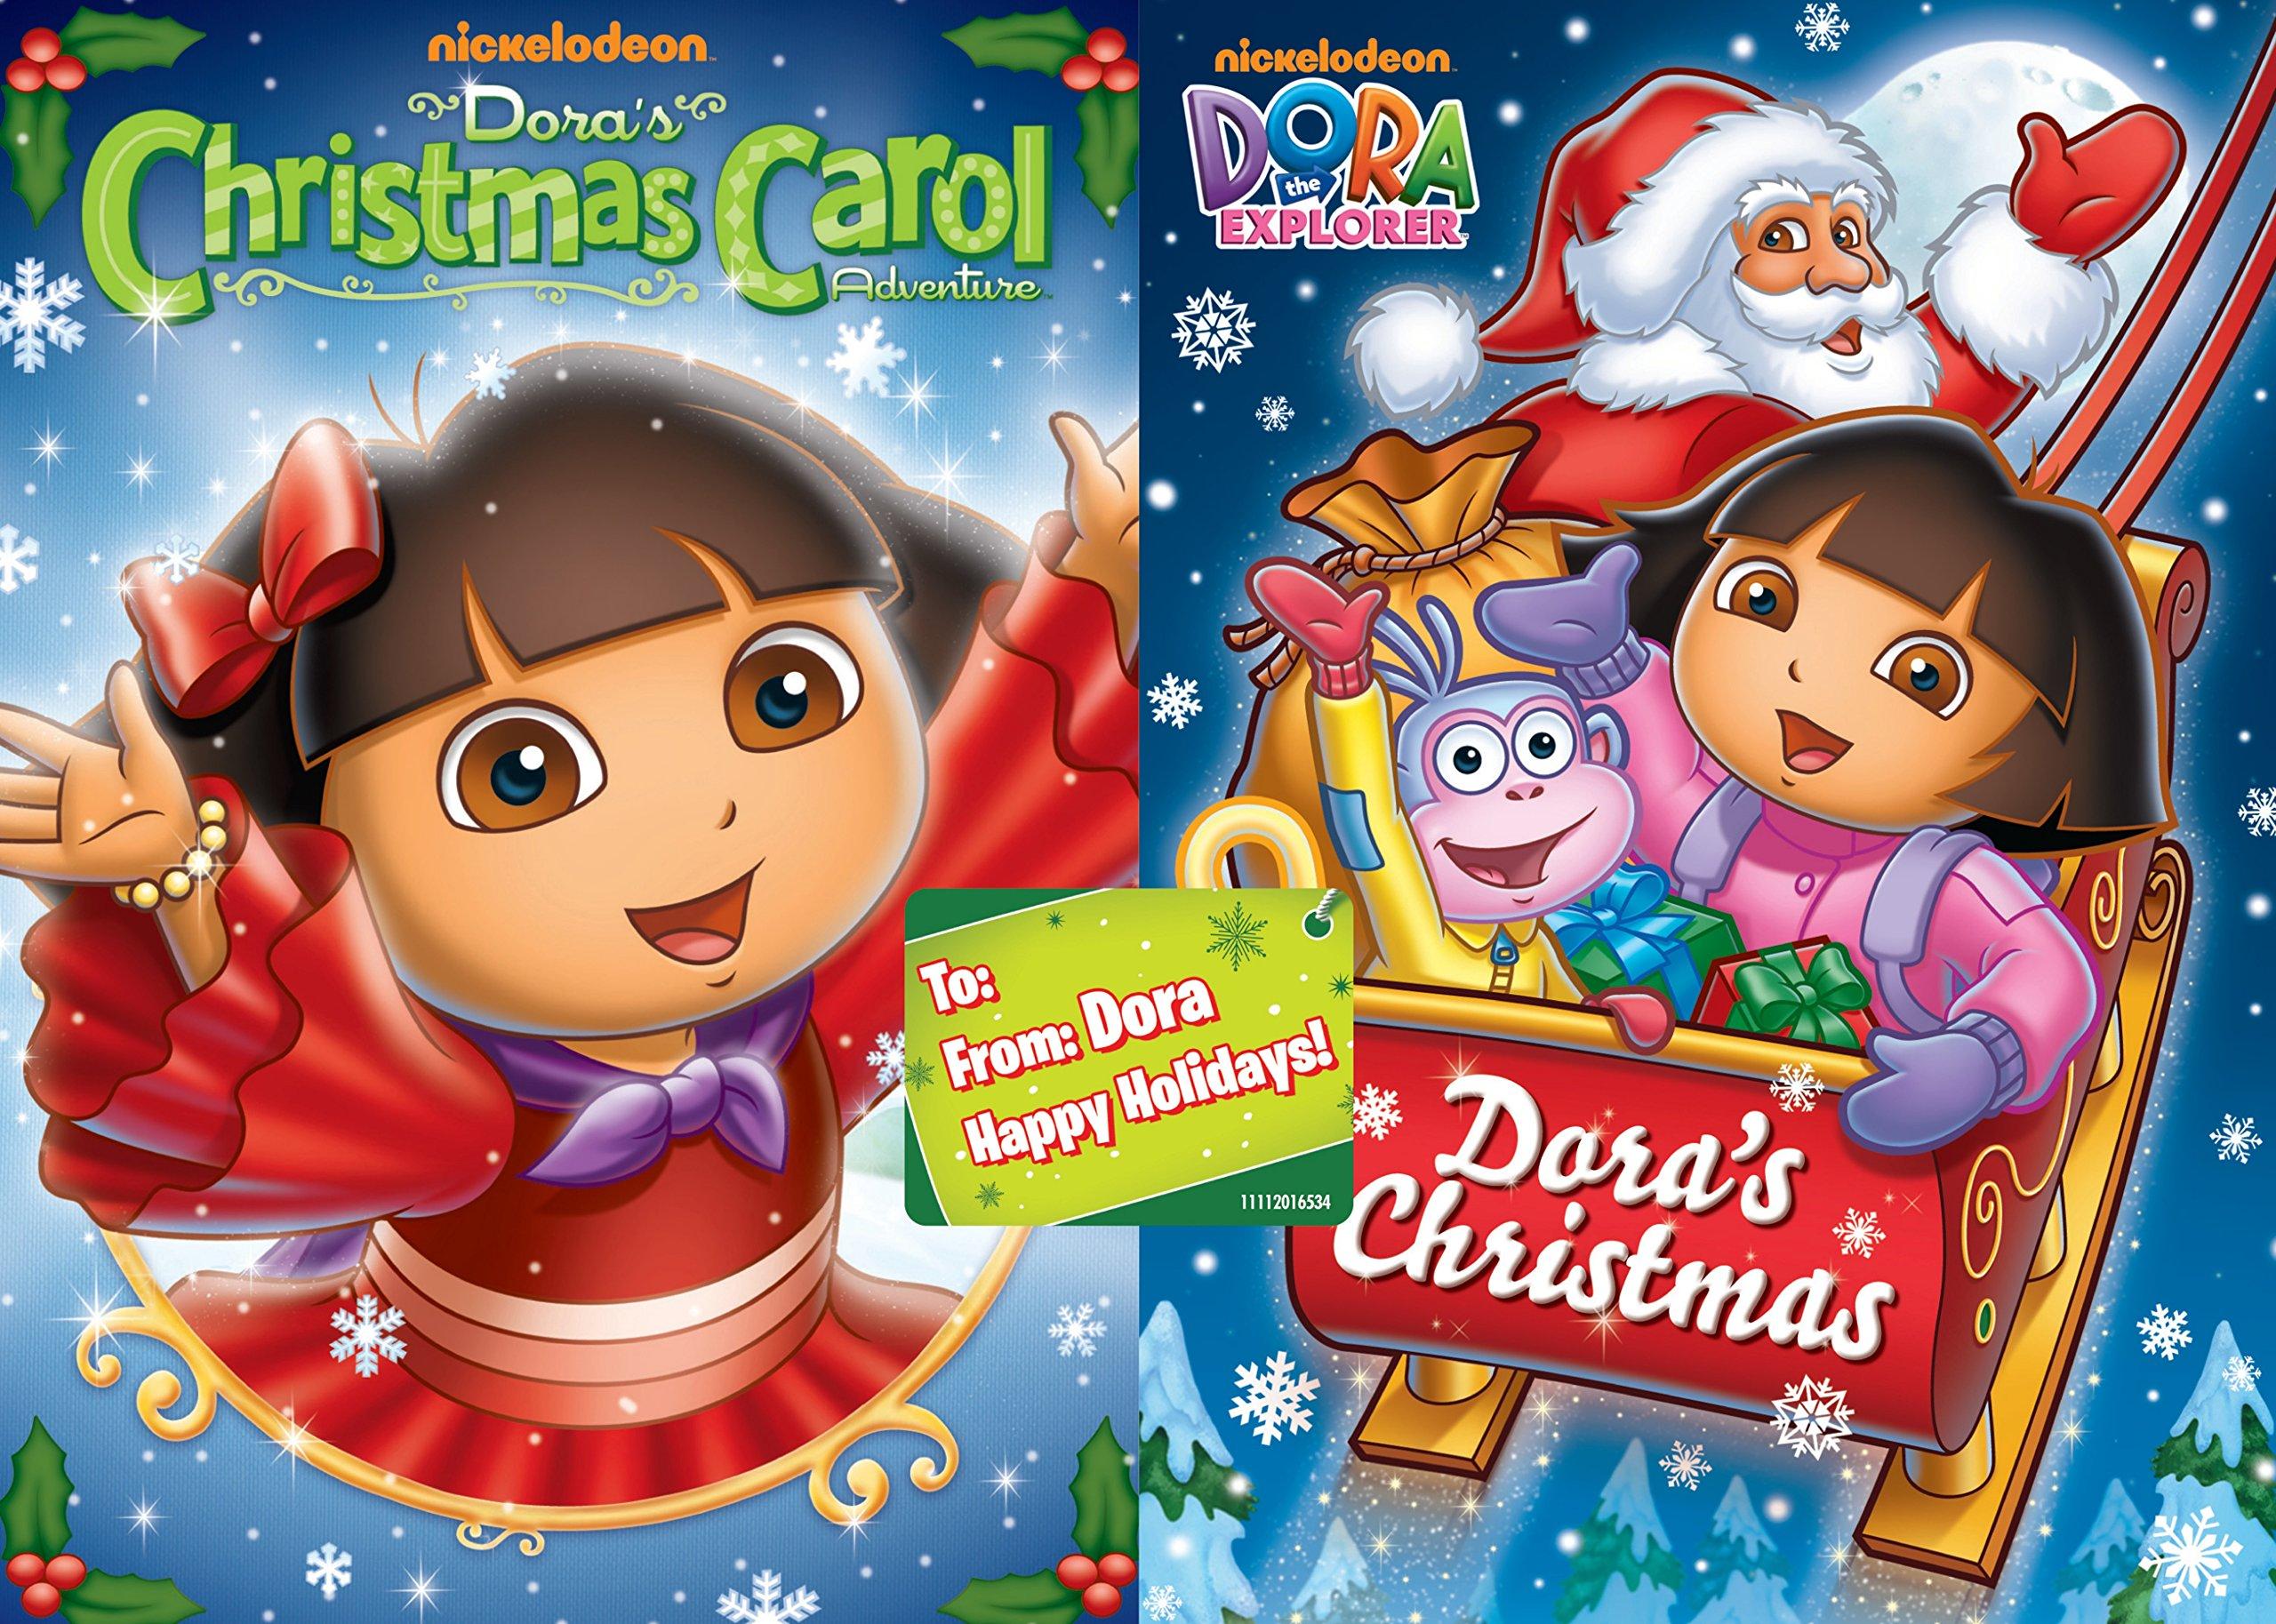 Amazon Paramount Dora The Explorer Christmas Carol Adv 2pk Dvd Side By 0097360754247 DORA THE EXPLORER Books